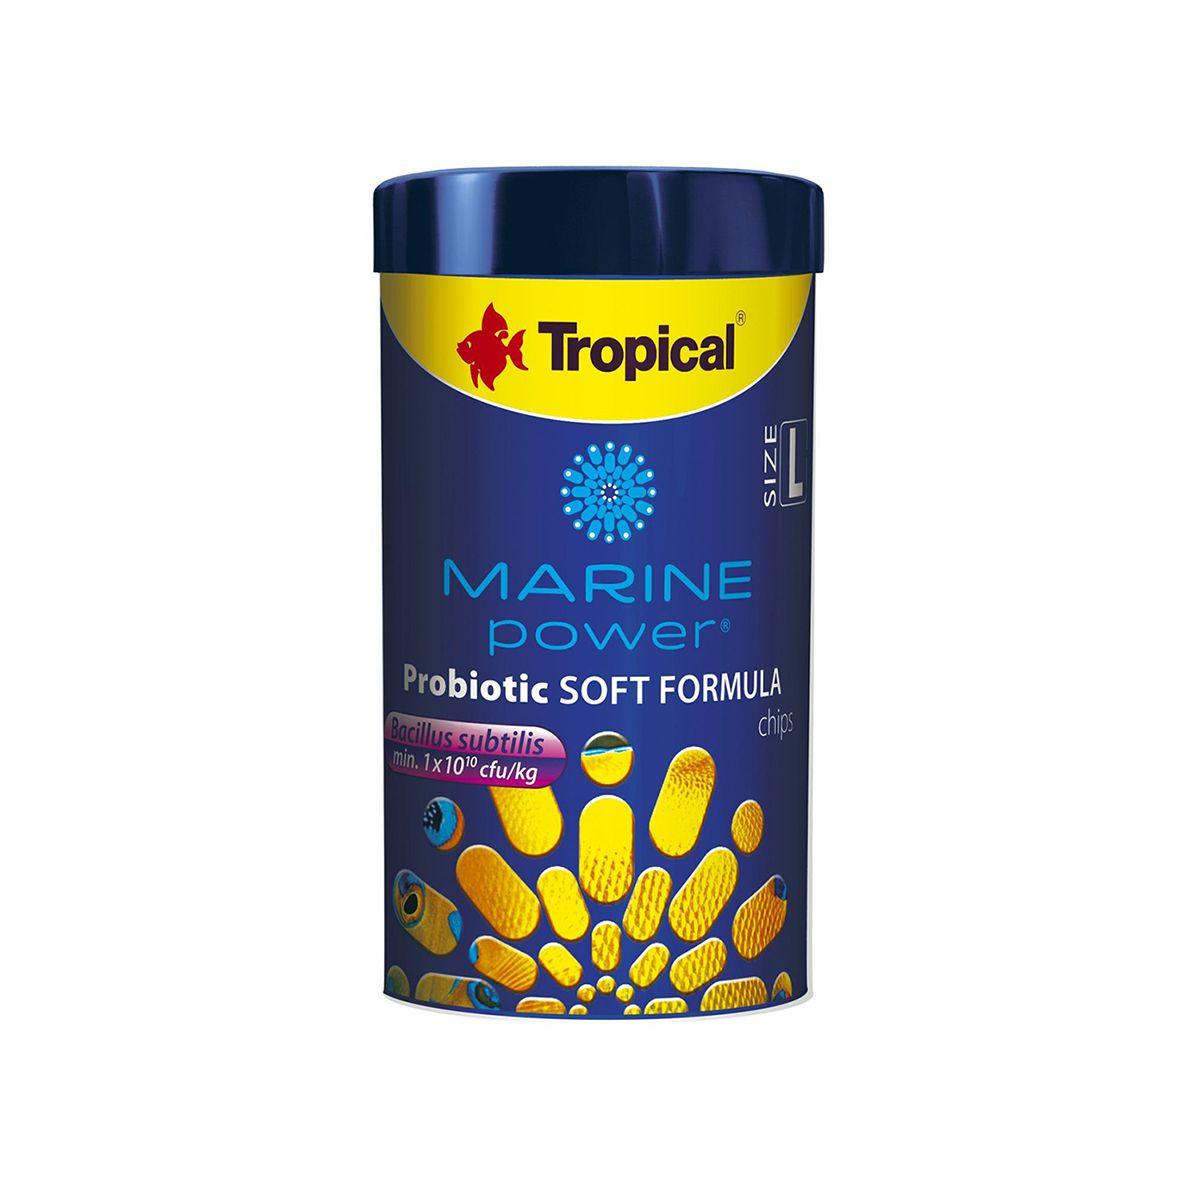 Tropical Marine Power Probiotic Soft Formula Size L 52g